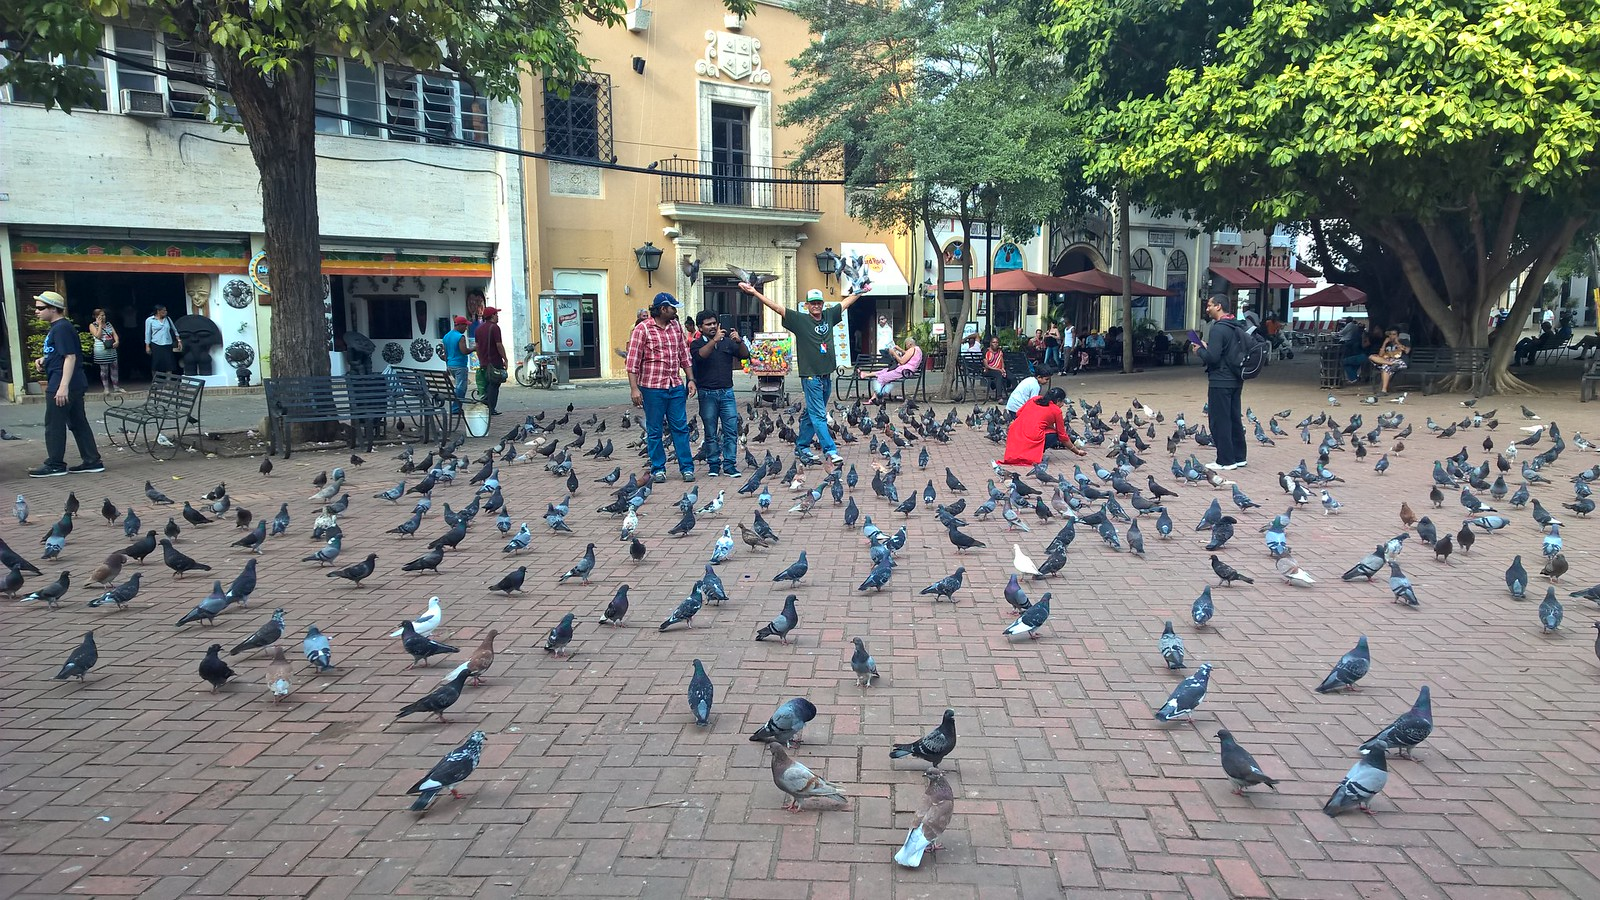 Площадь в Парке Колумба